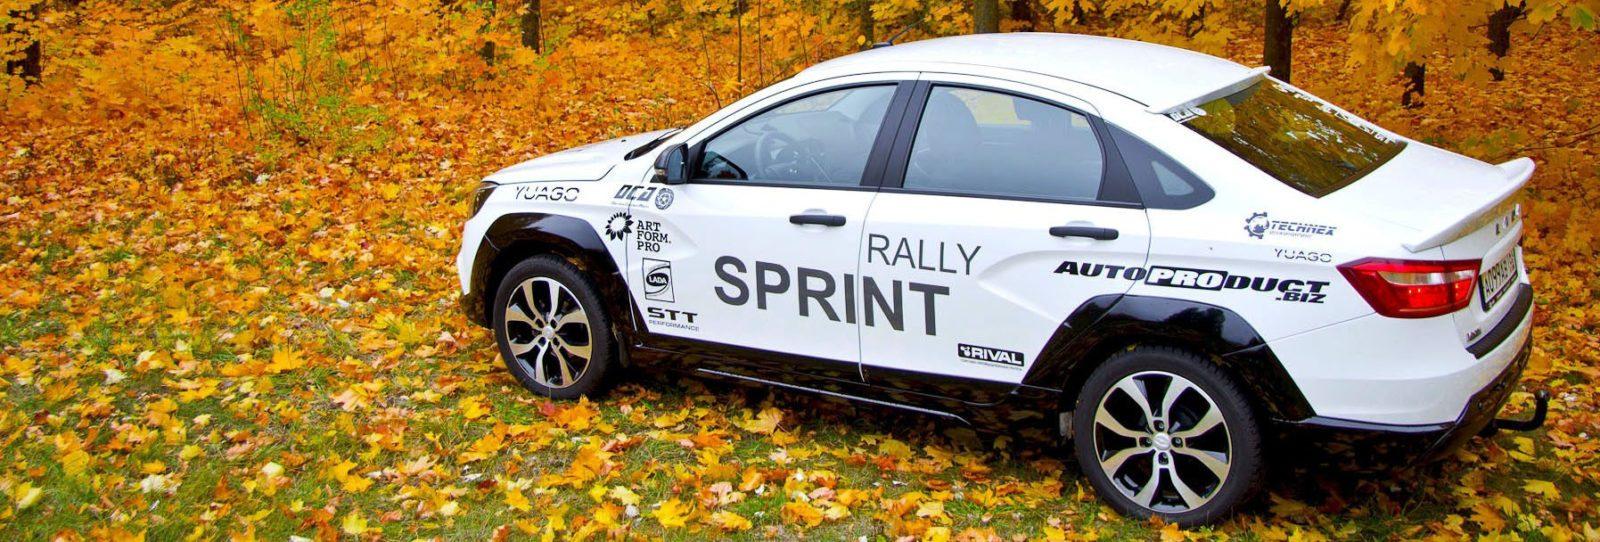 О кросс-комплекте Vesta Rally Sprint